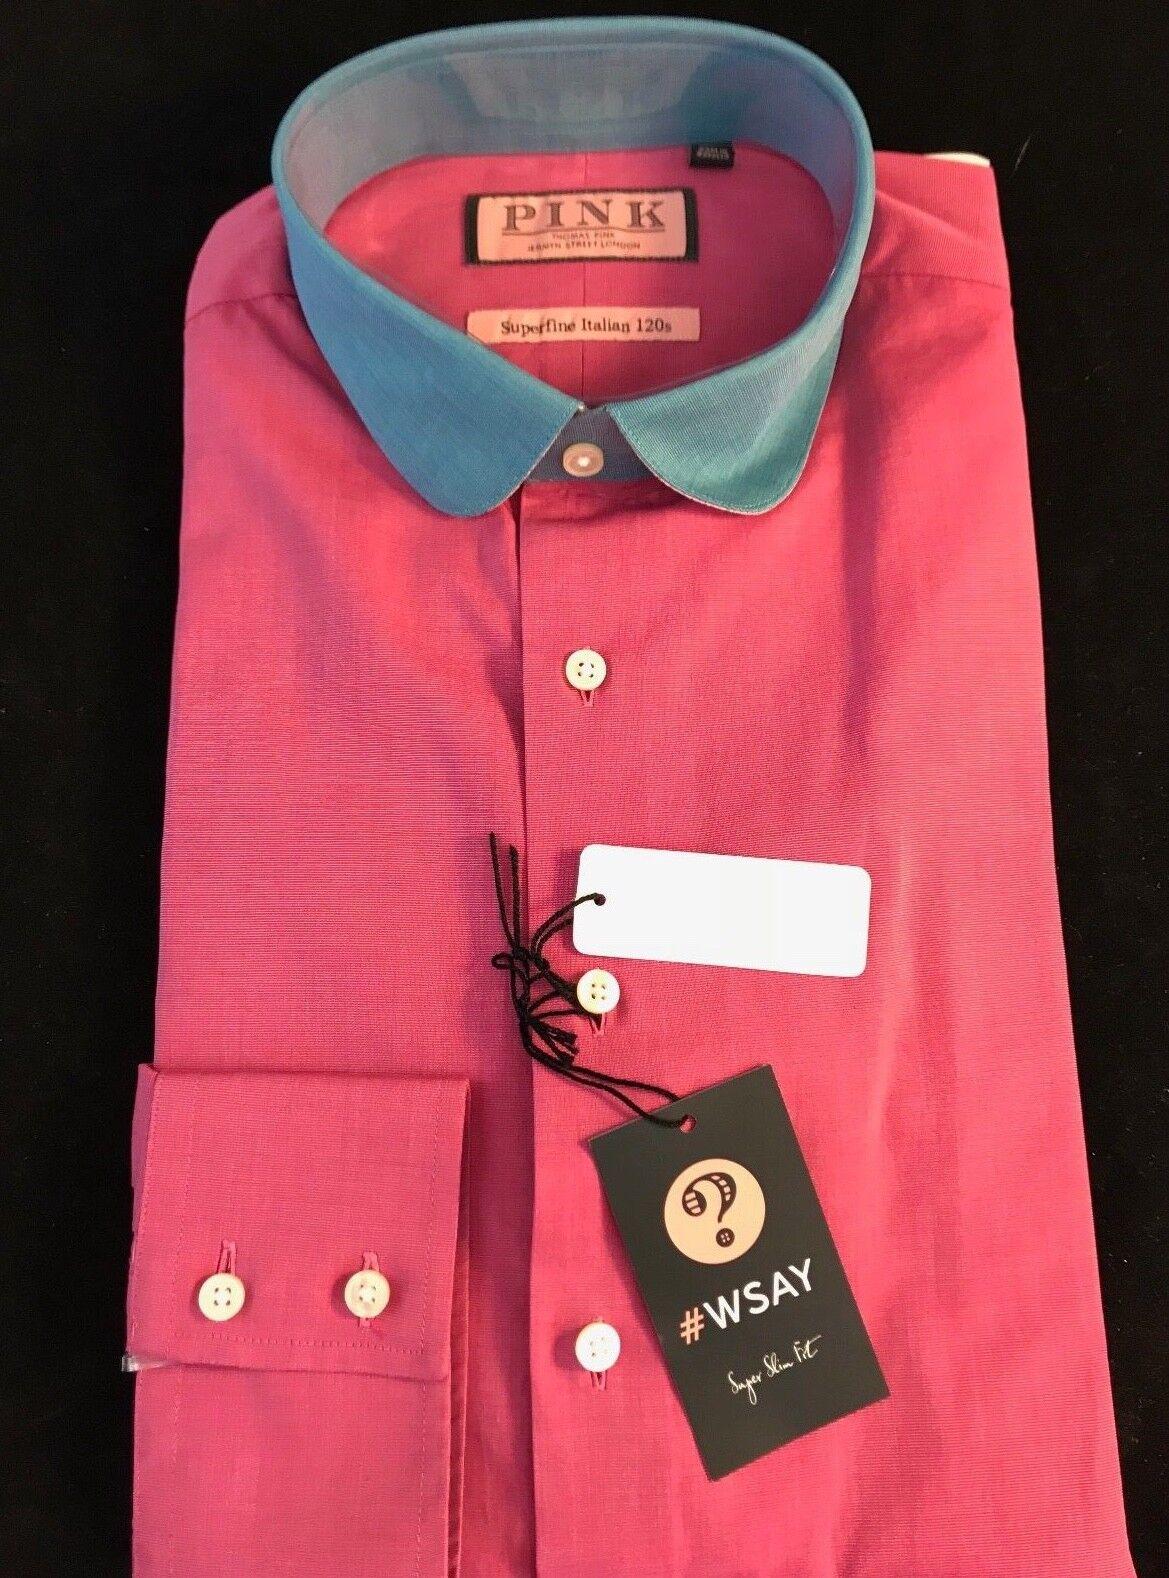 BNWT Thomas rosa Gents SF SUPER Eldon Plain LS Super Slim Fit Colletto Camicia 15.5